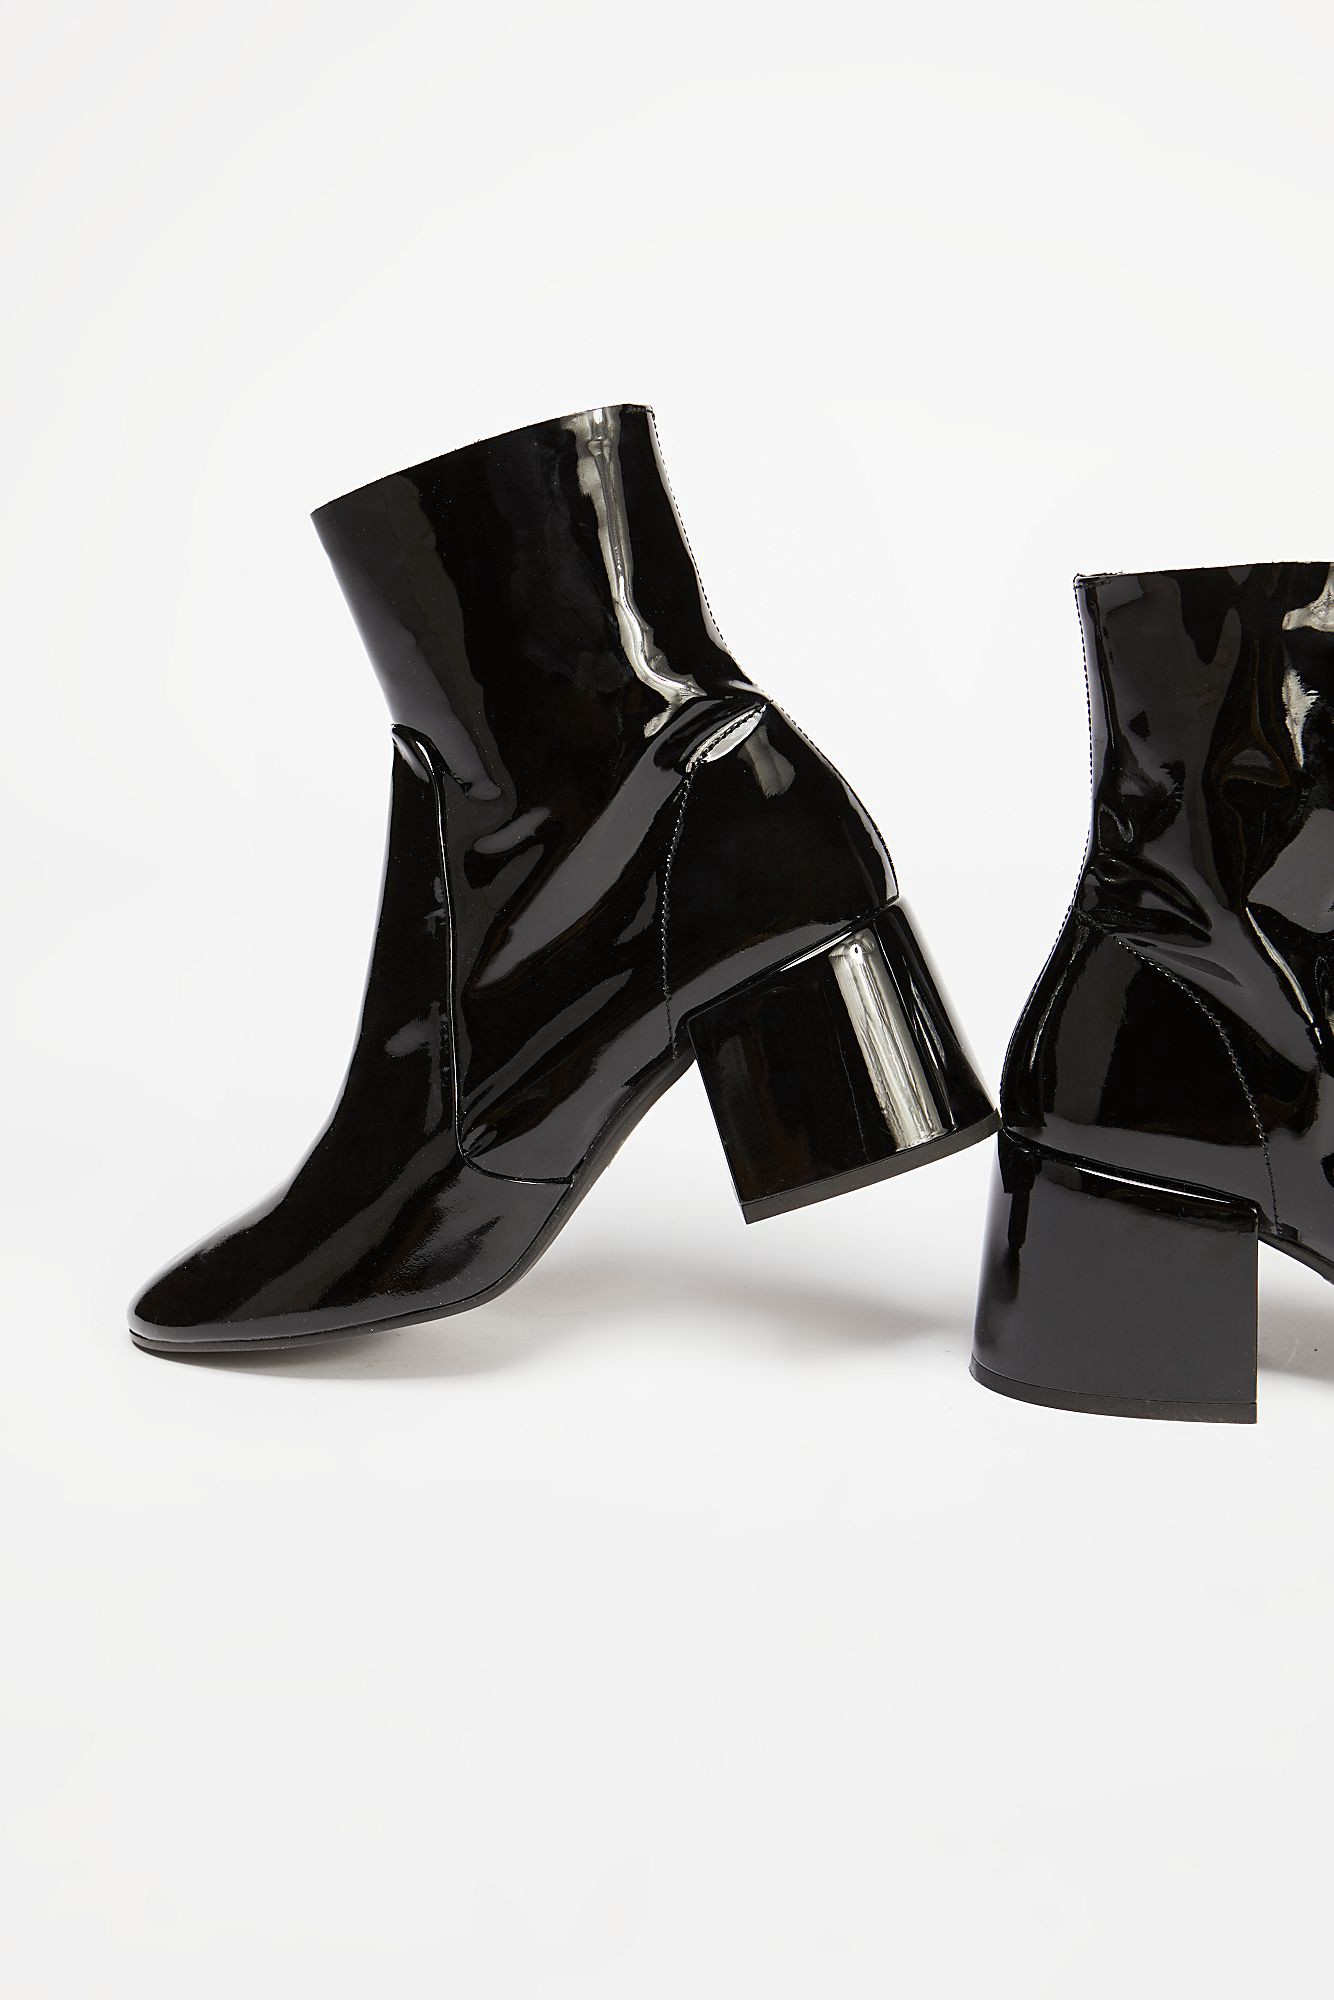 fcc94522ccb4 Free People Lillian Heel Boot - Black Patent 37 Euro